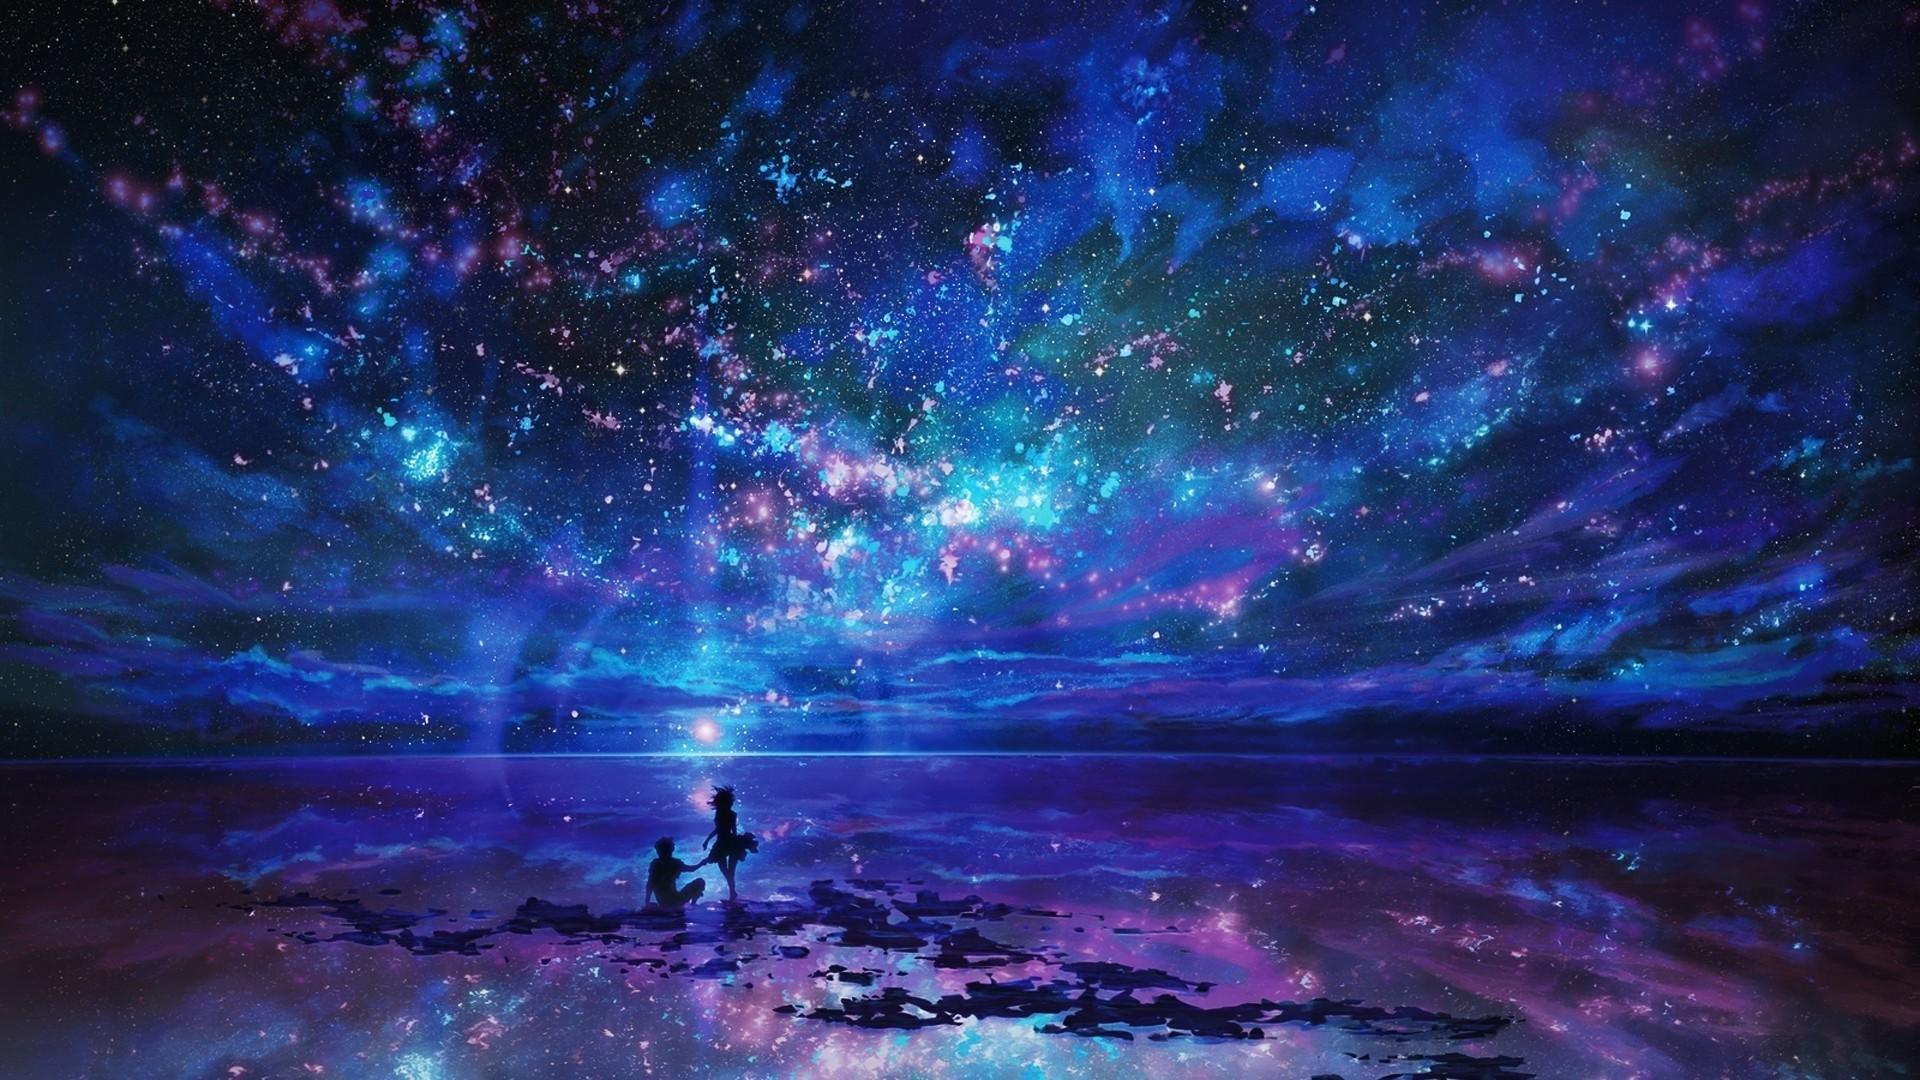 Celestial HD Wallpaper